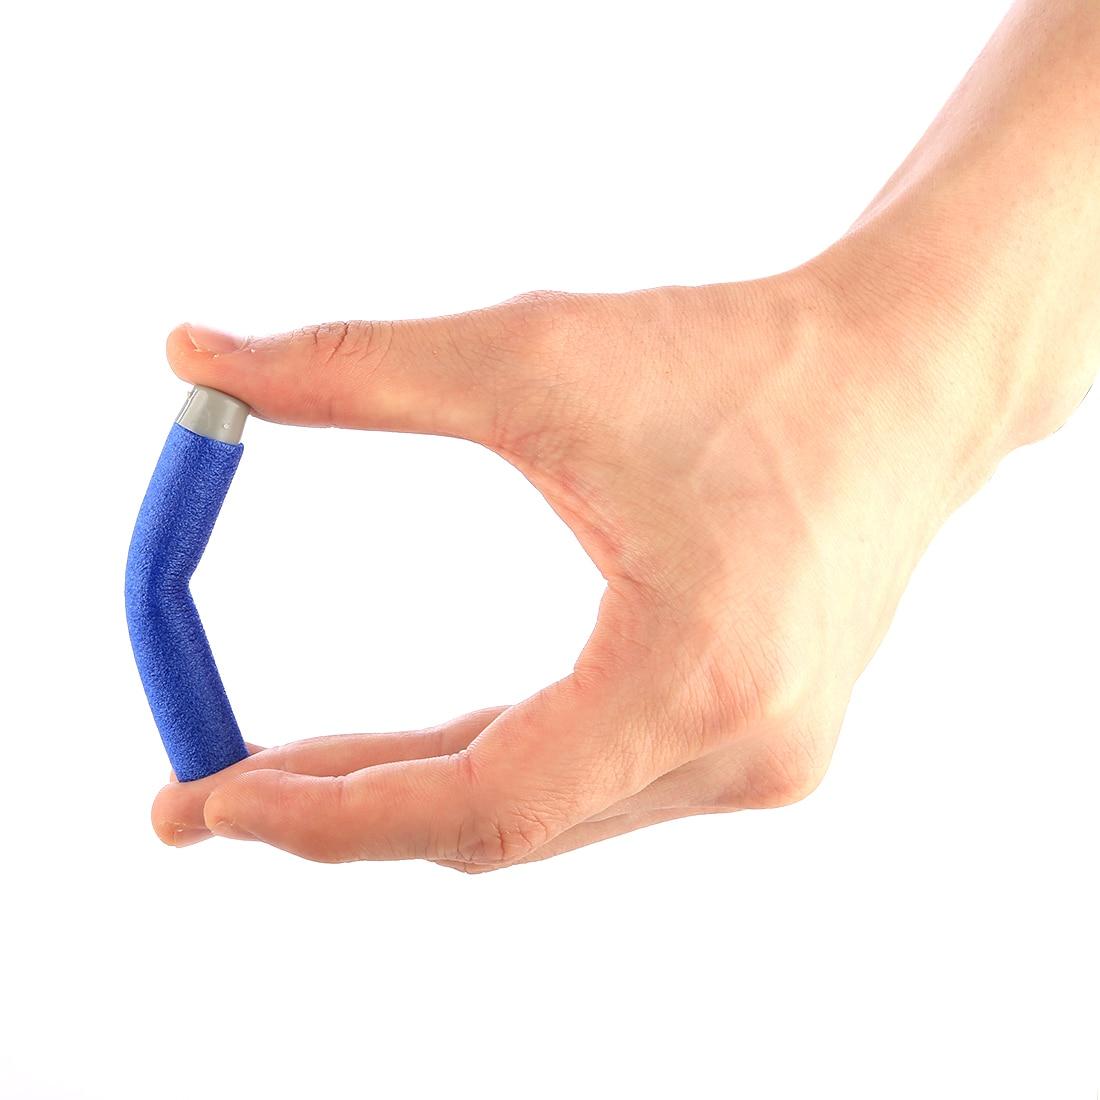 NFSTRIKE 1000pcs 7.2 * 1.3cm რბილი ტყვიები - გარე გართობა და სპორტი - ფოტო 5